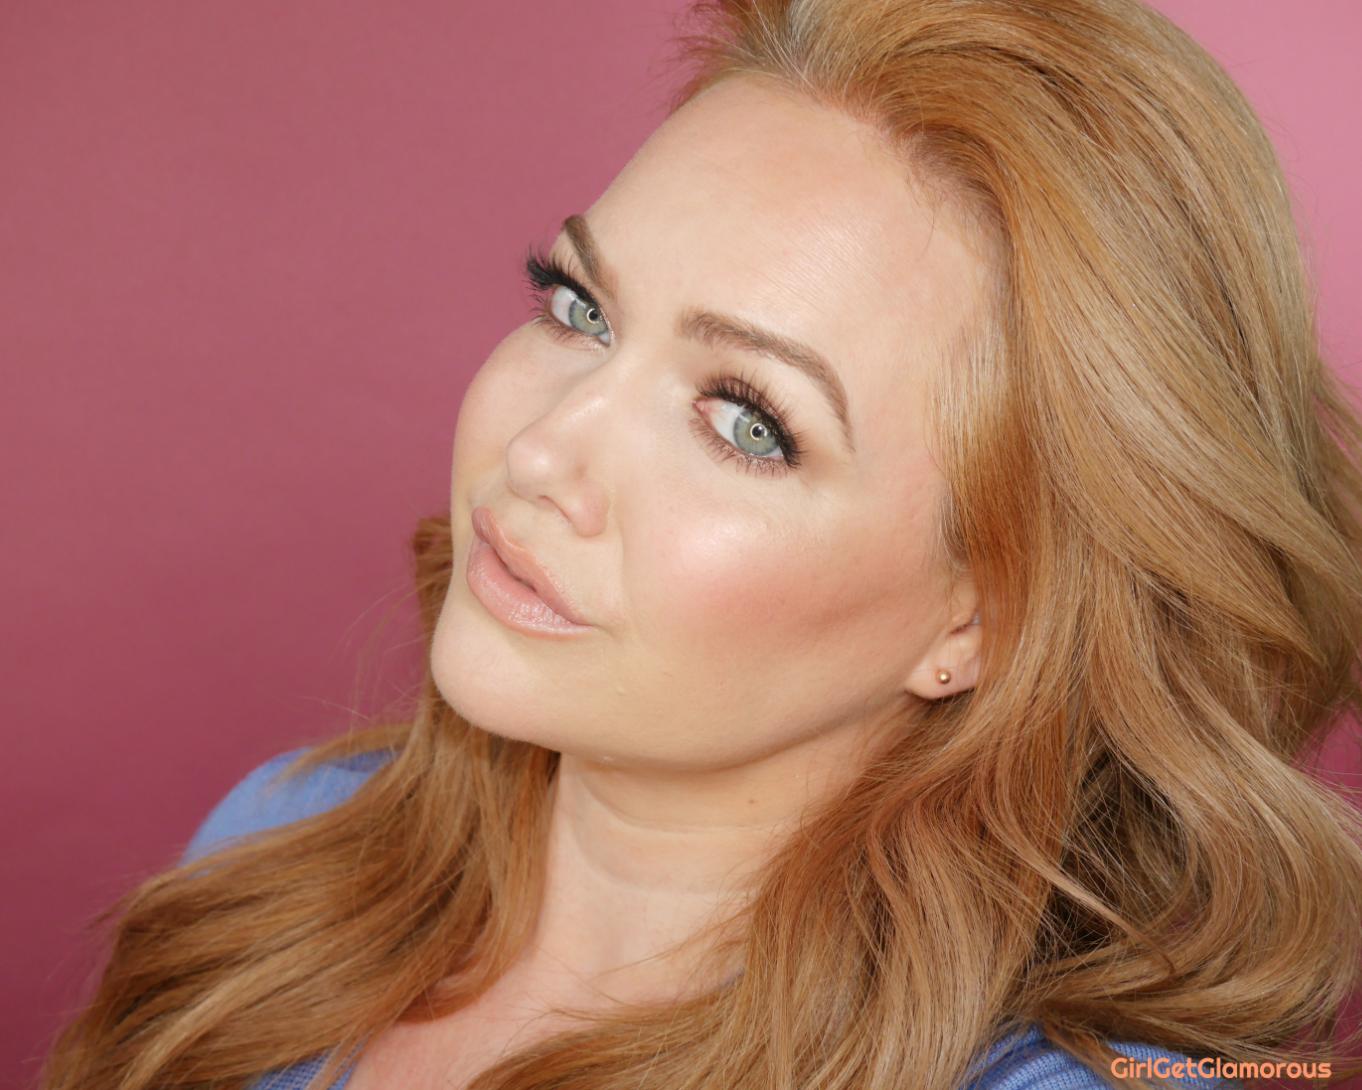 Best Foundation For Mature Skin 2020 Concealer Tutorial | 35+ Mature Skin • GirlGetGlamorous